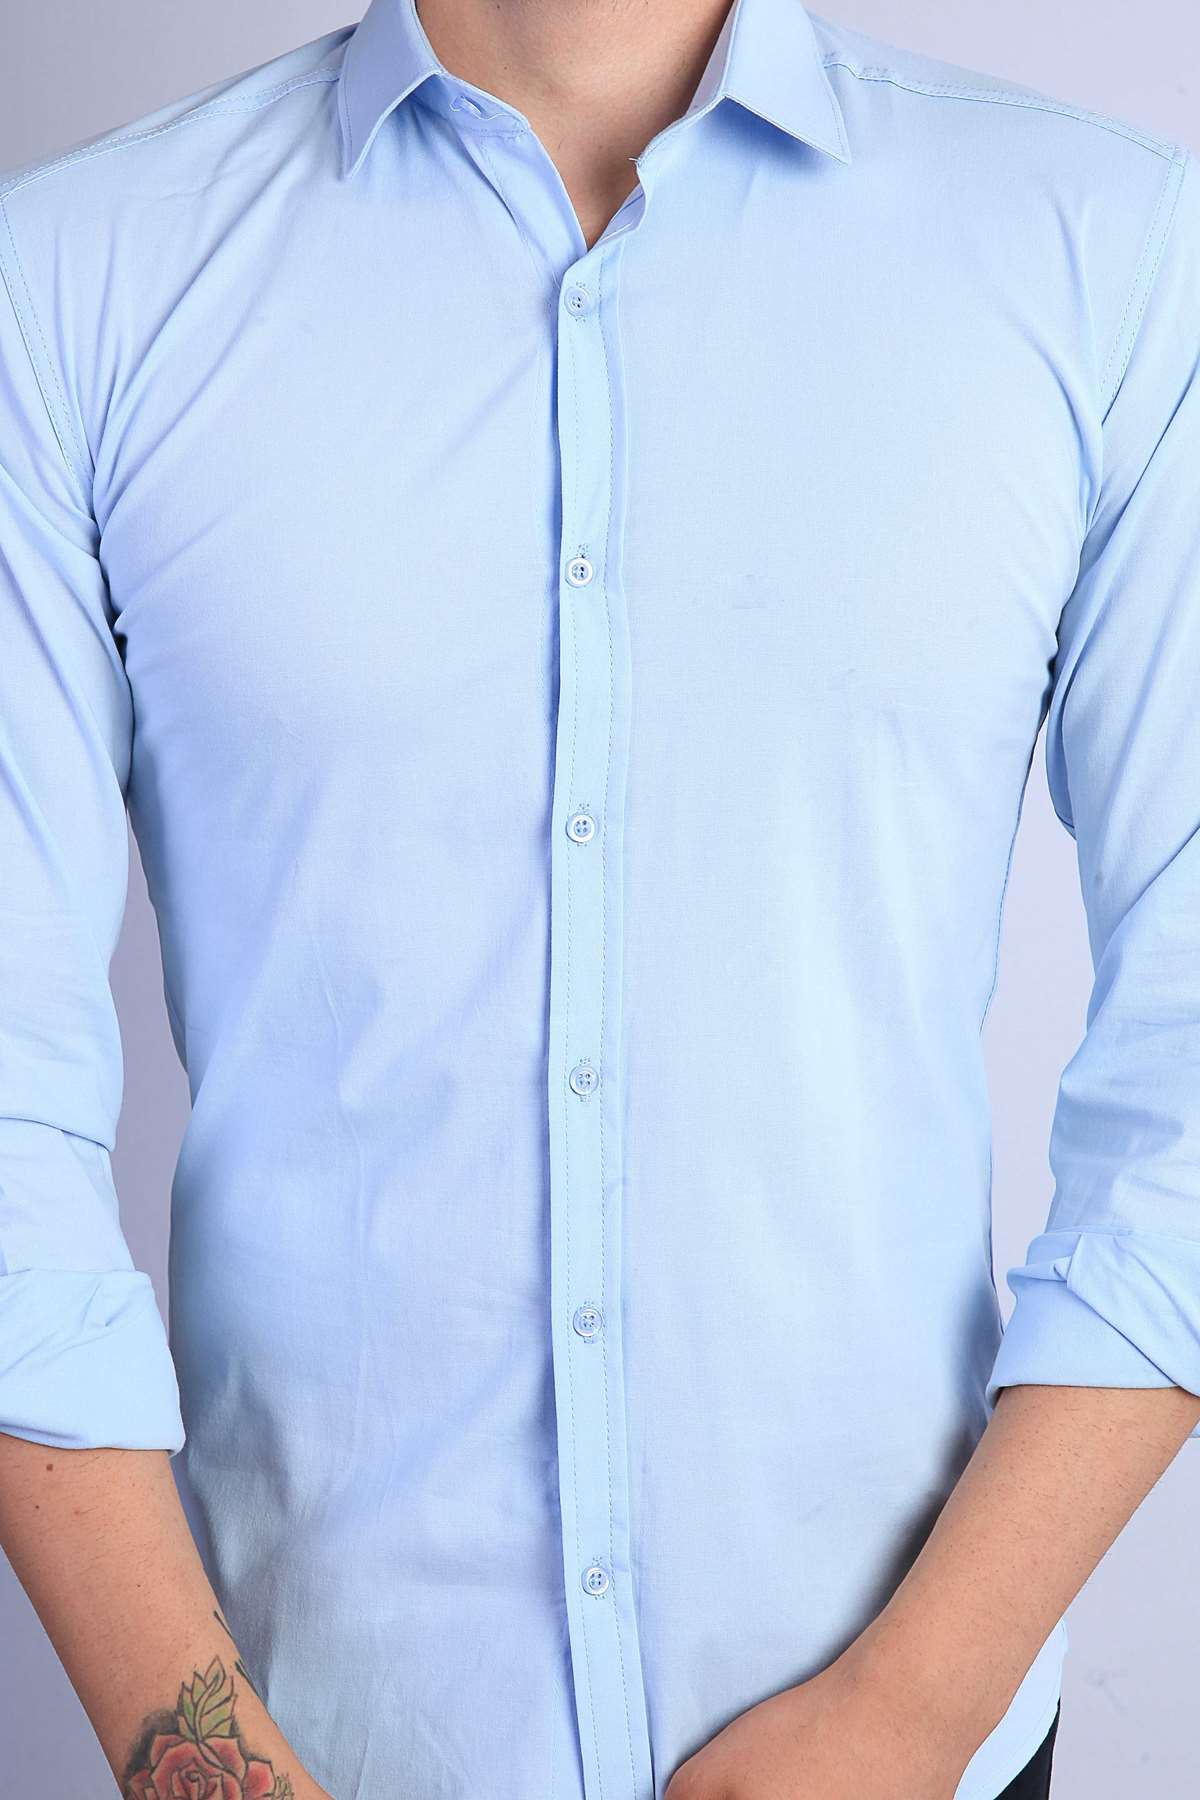 Klasik Yaka Uzun Kol Slim Fit Gömlek Mavi